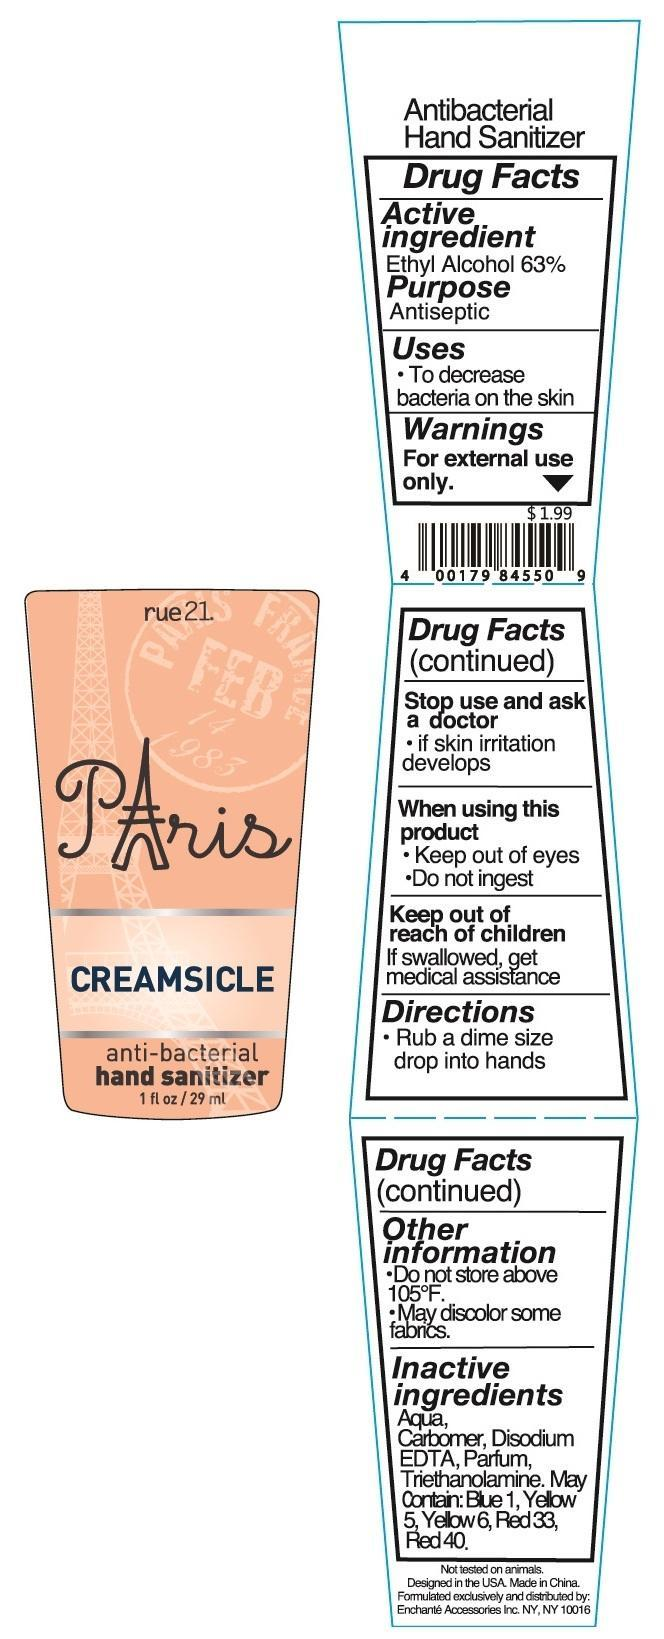 Rue 21 Paris Creamsicle Anti Bacterial Hand Sanitizer (Alcohol) Liquid [Enchante Accessories Inc. ]